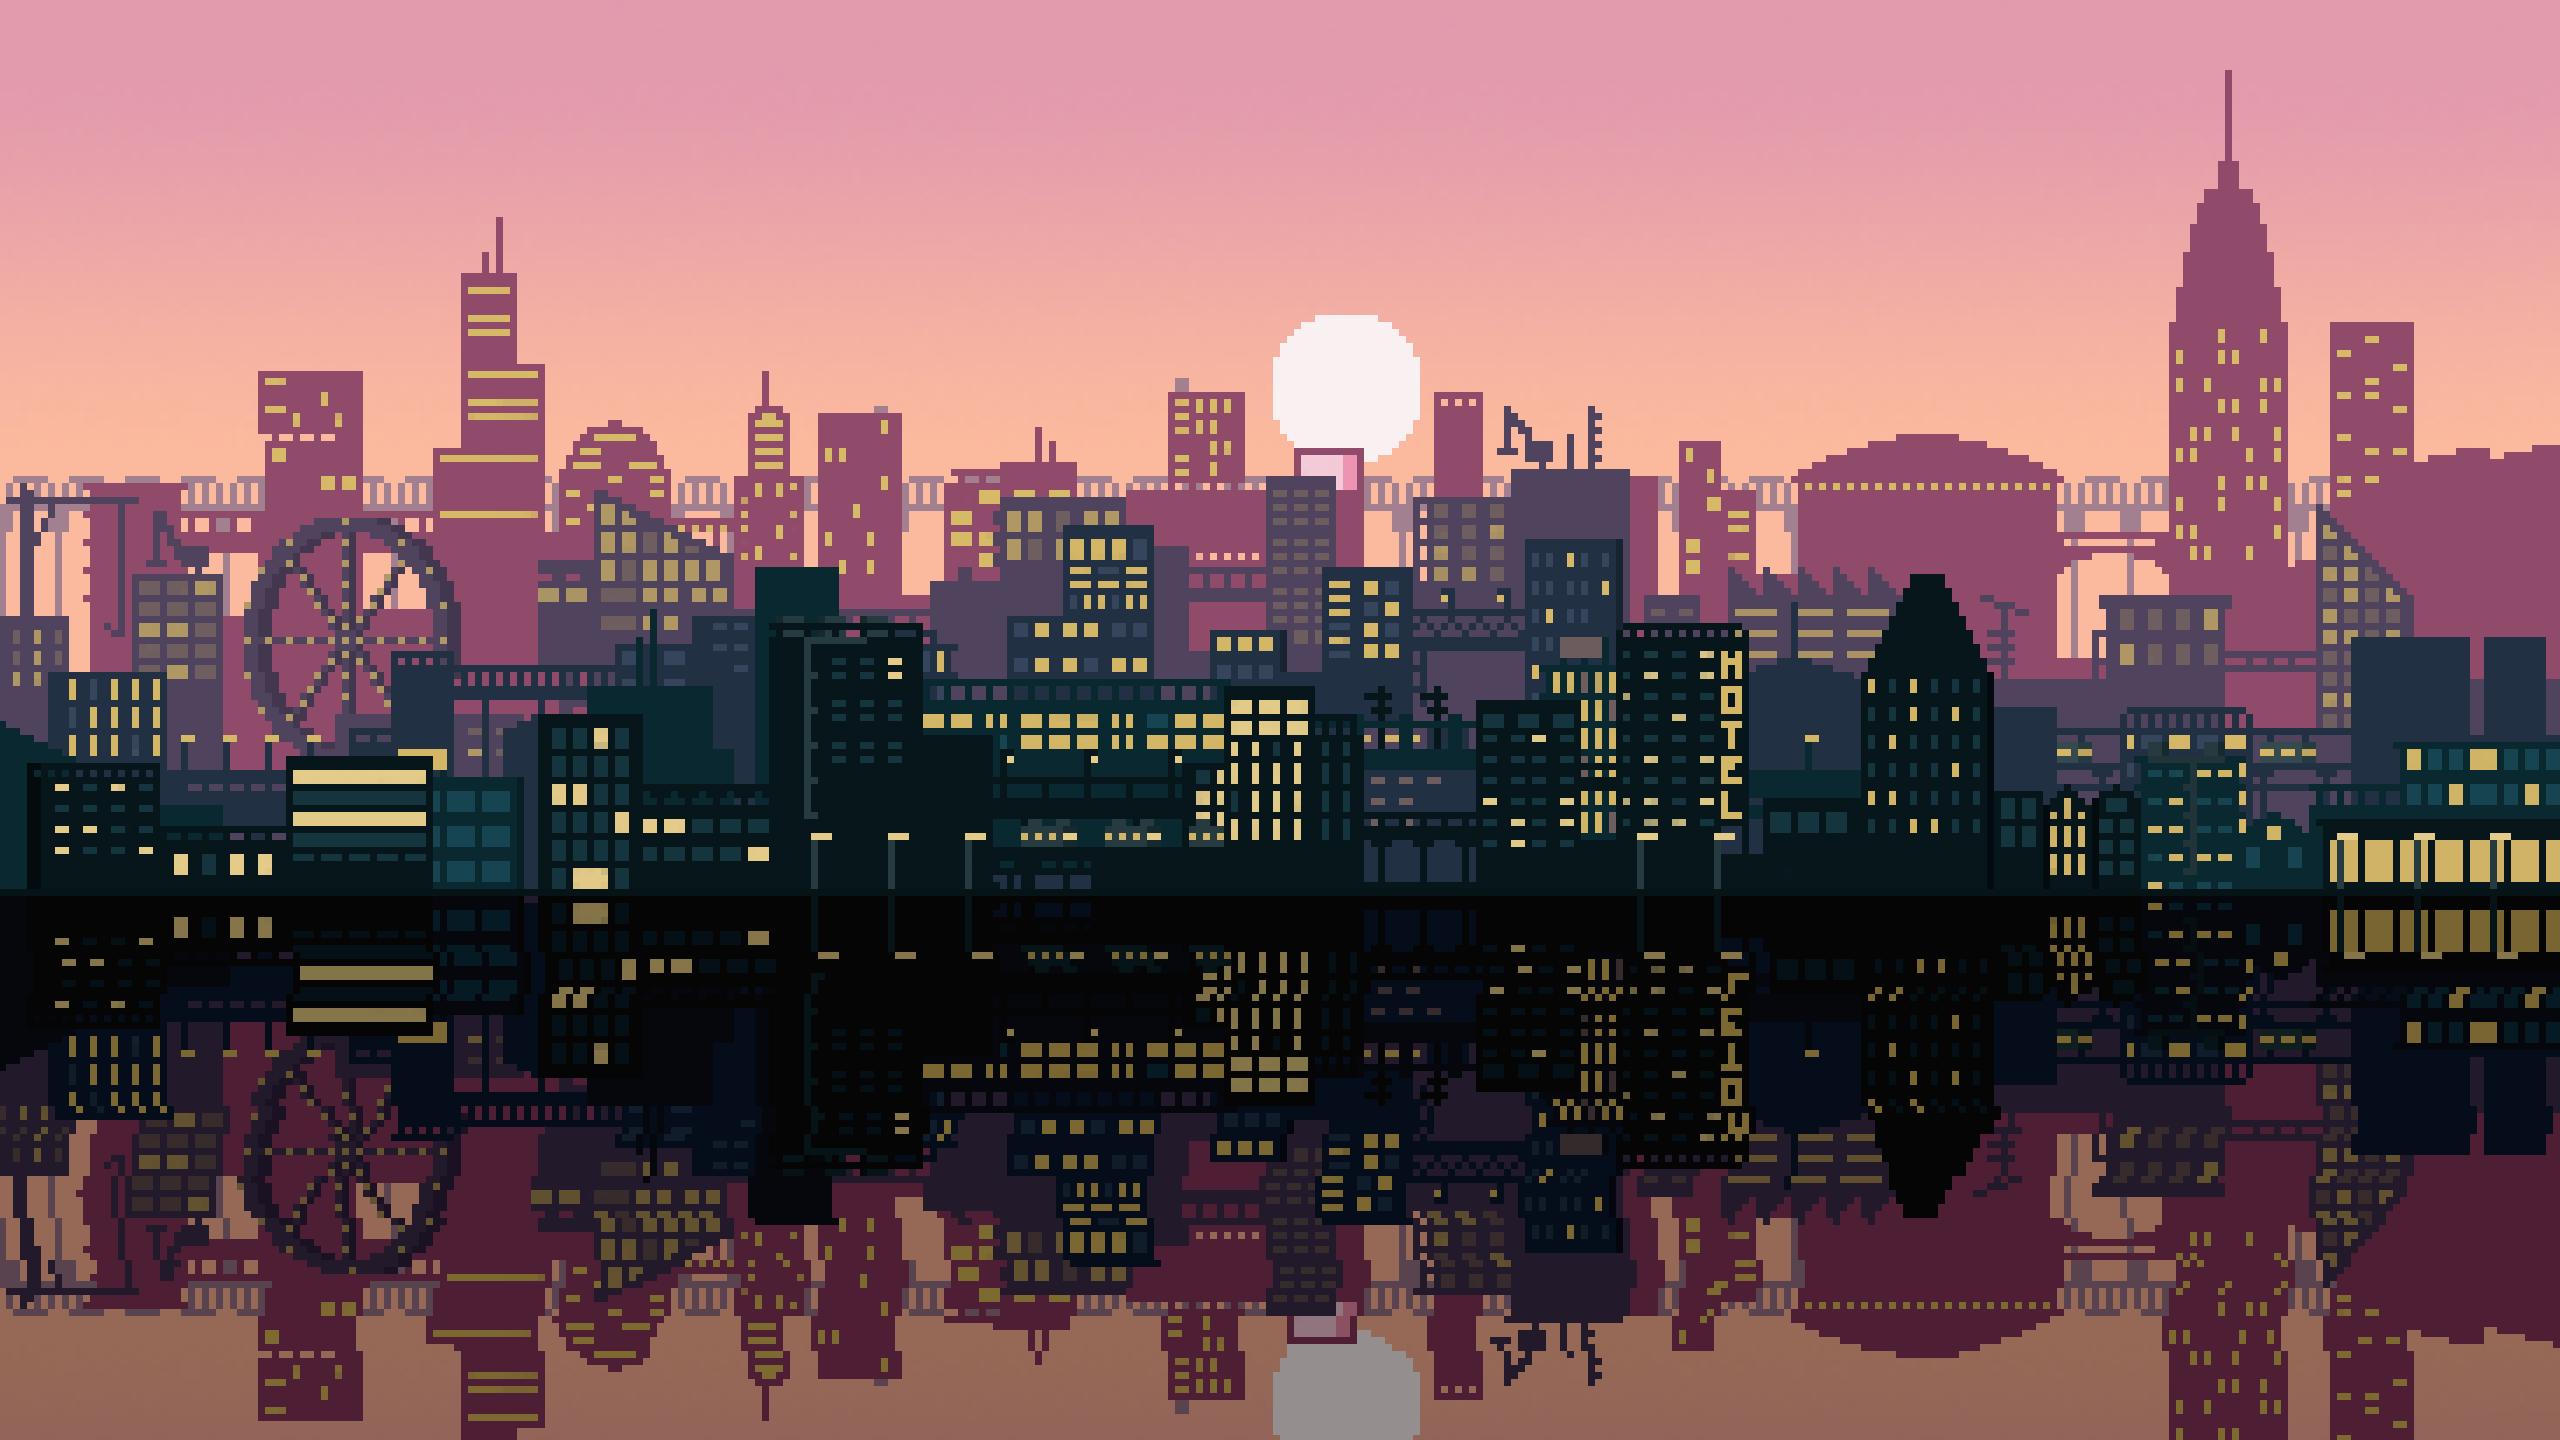 pixel art city 2560x1440 oc free beautiful wallpaper